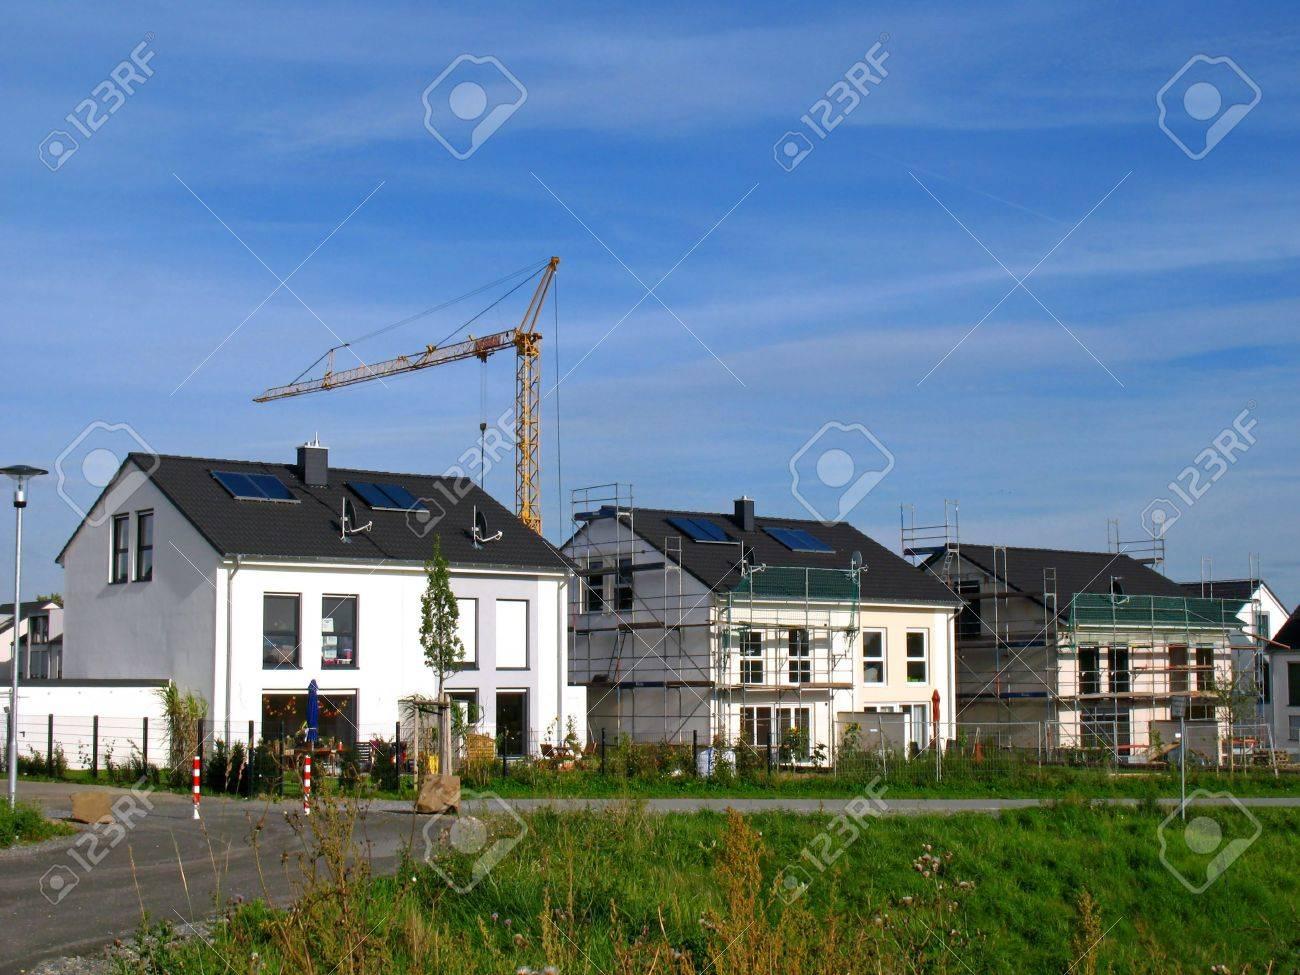 Detached houses - 11214976